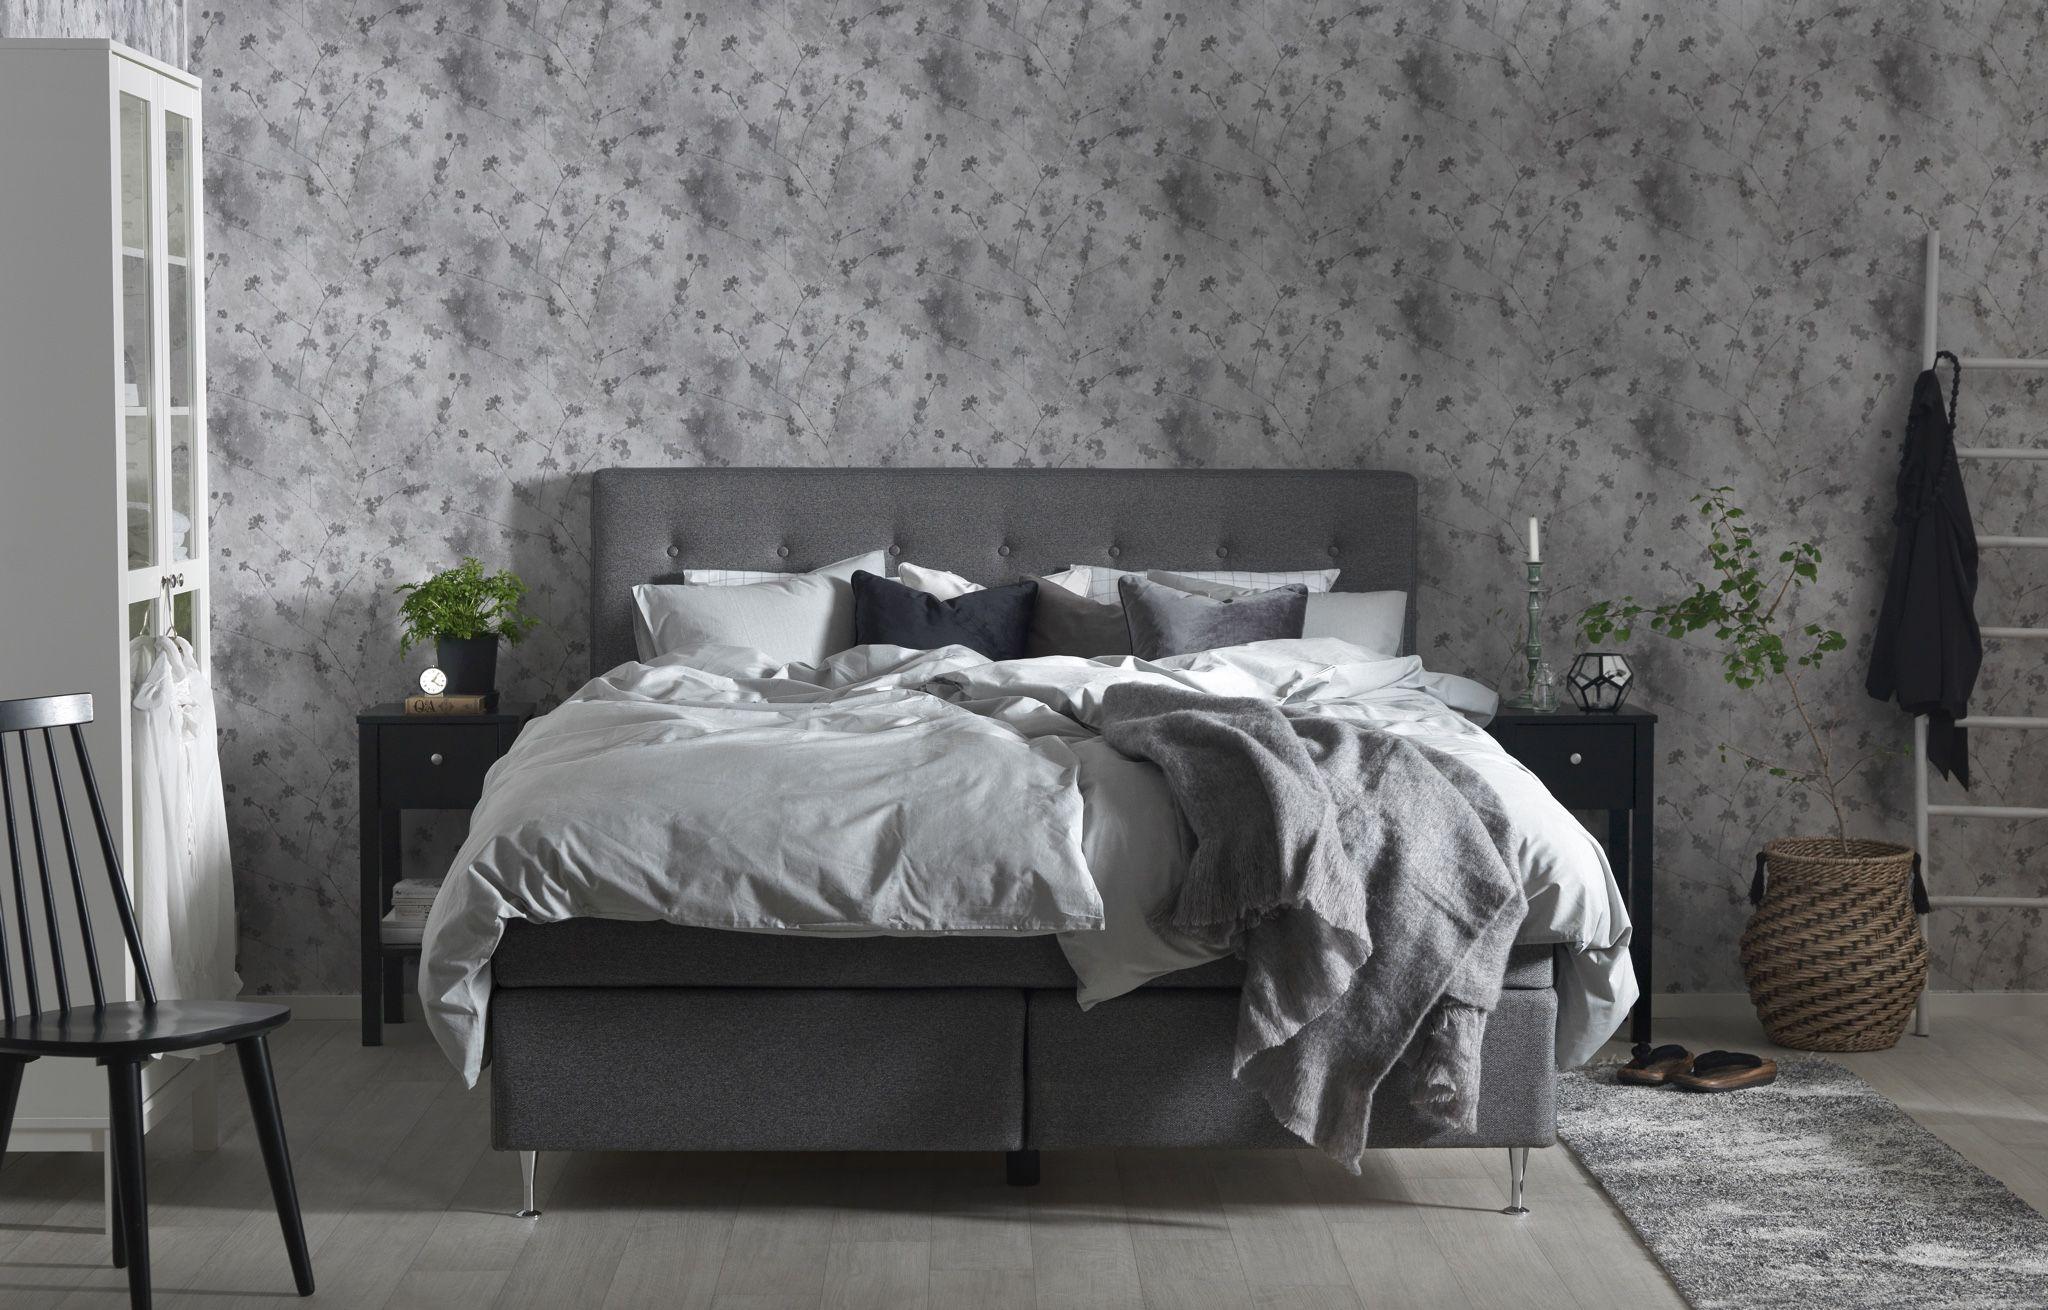 Cumulus Nyäng säng, sovrum i grå harmoni Em home Sovrum Pinterest Sovrum